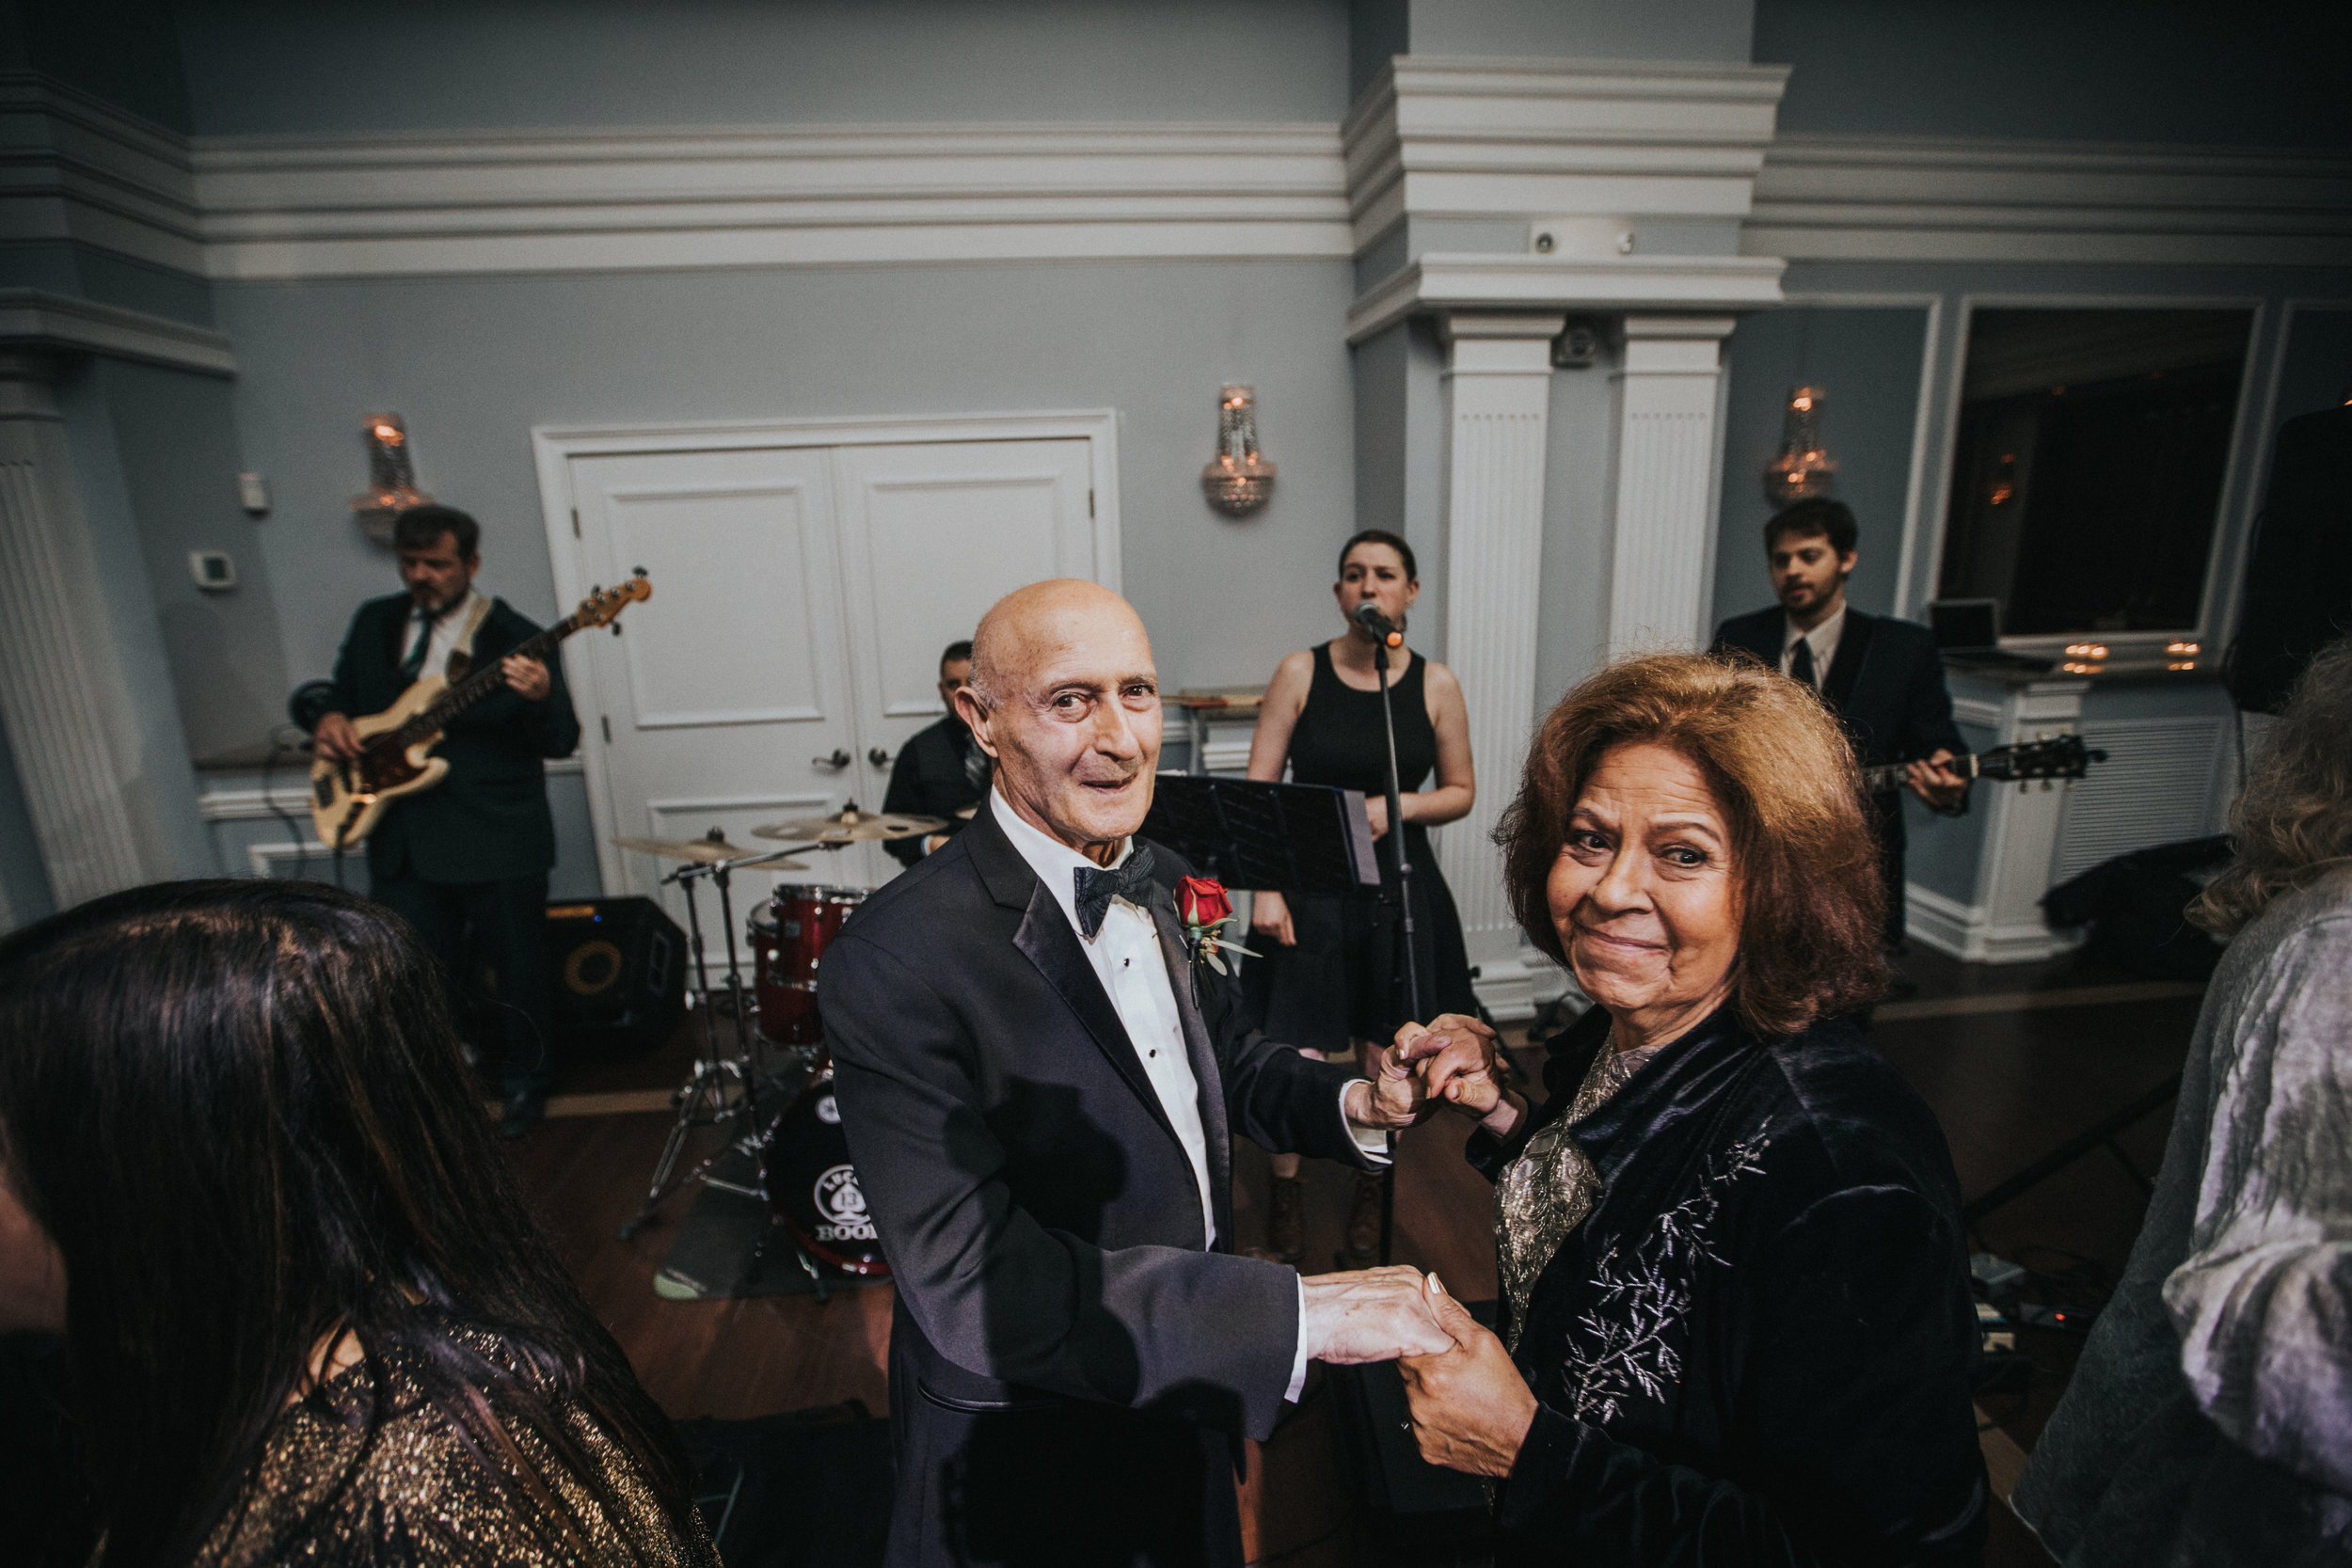 JennaLynnPhotography-NJWeddingPhotographer-Philadelphia-Wedding-ArtsBallroom-Reception-164.jpg